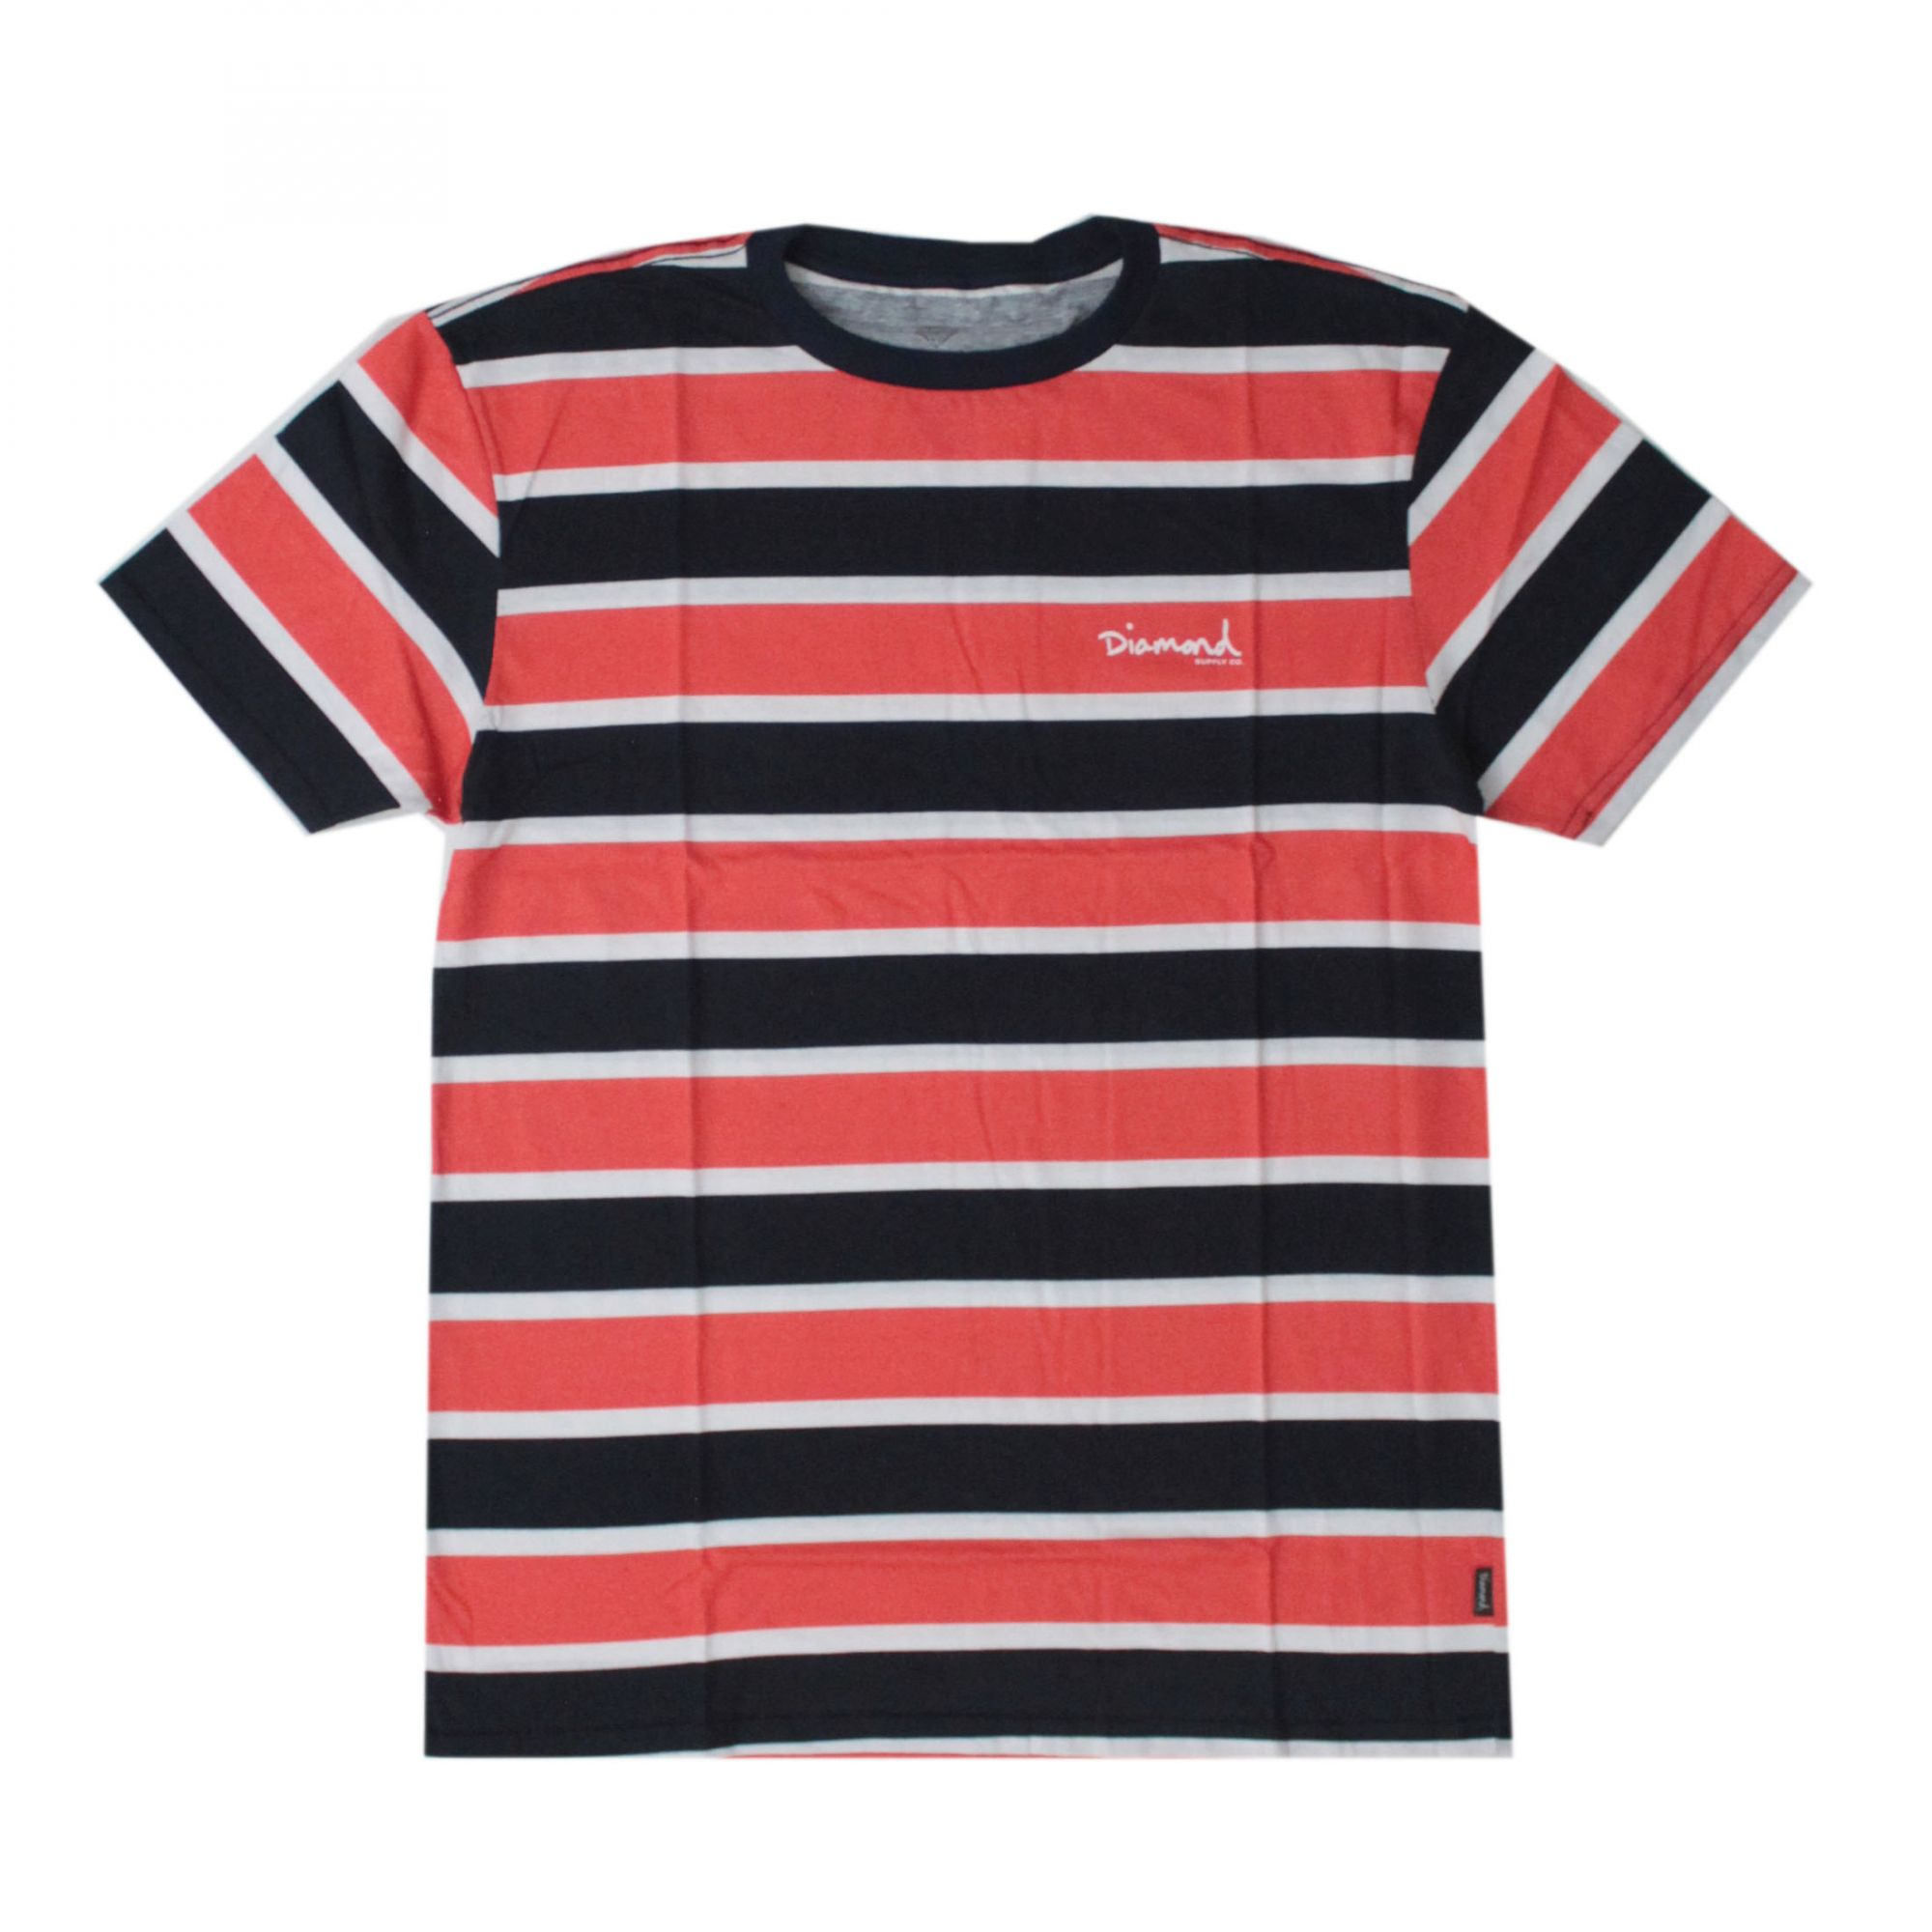 Camiseta Diamond Mini Og Script Striped Tee Vermelho/Azul Marinho